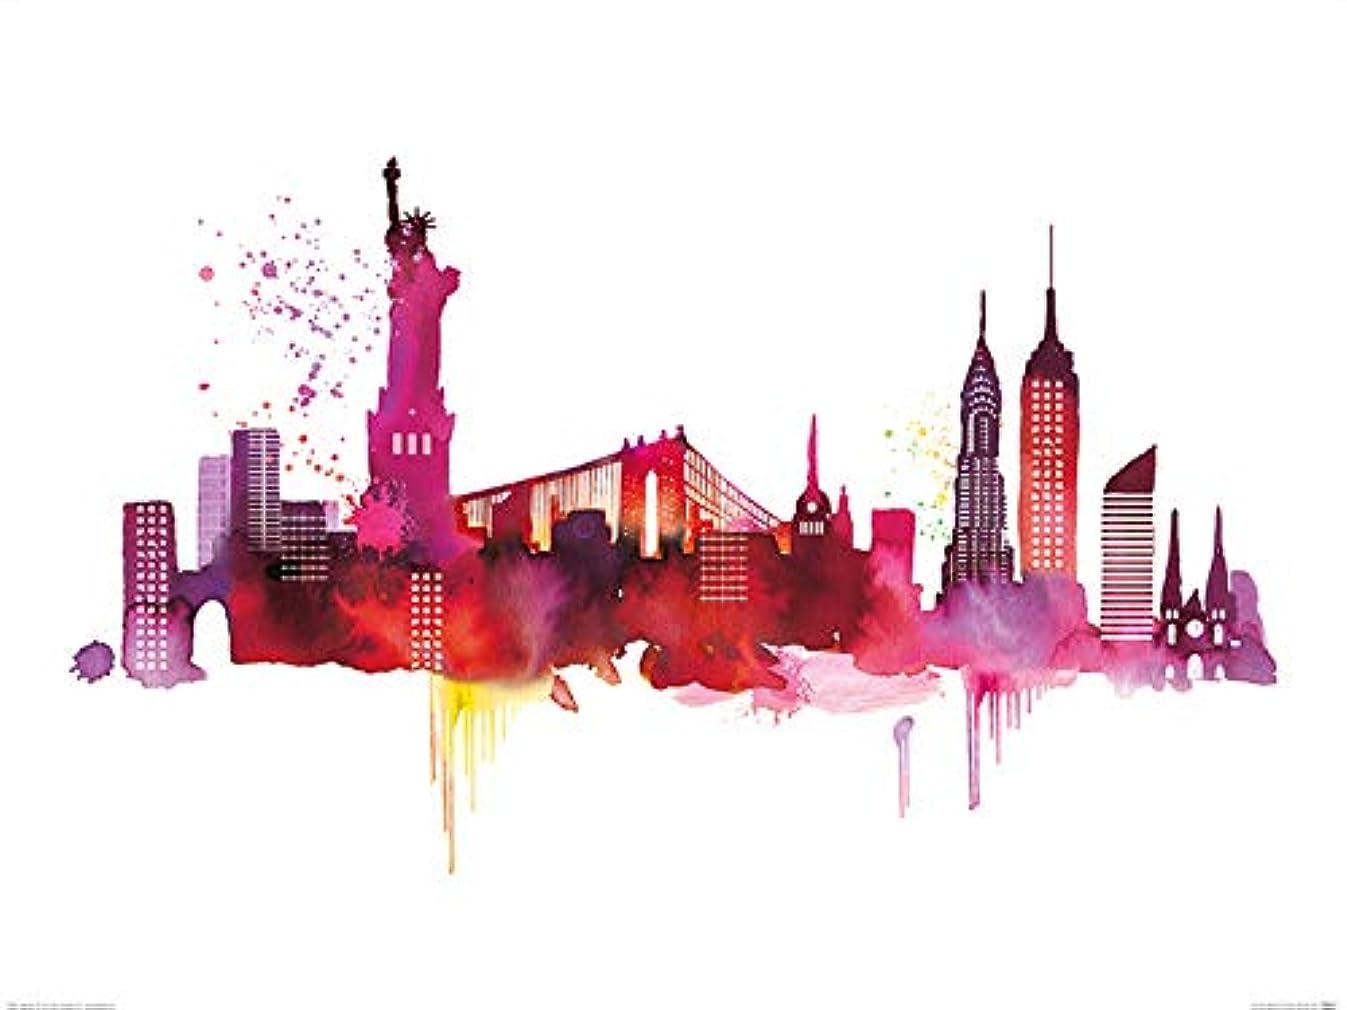 Art Group The Summer Thornton (New York Skyline) Print, Paper, Multi-Colour, 60 x 80 x 1.3 cm